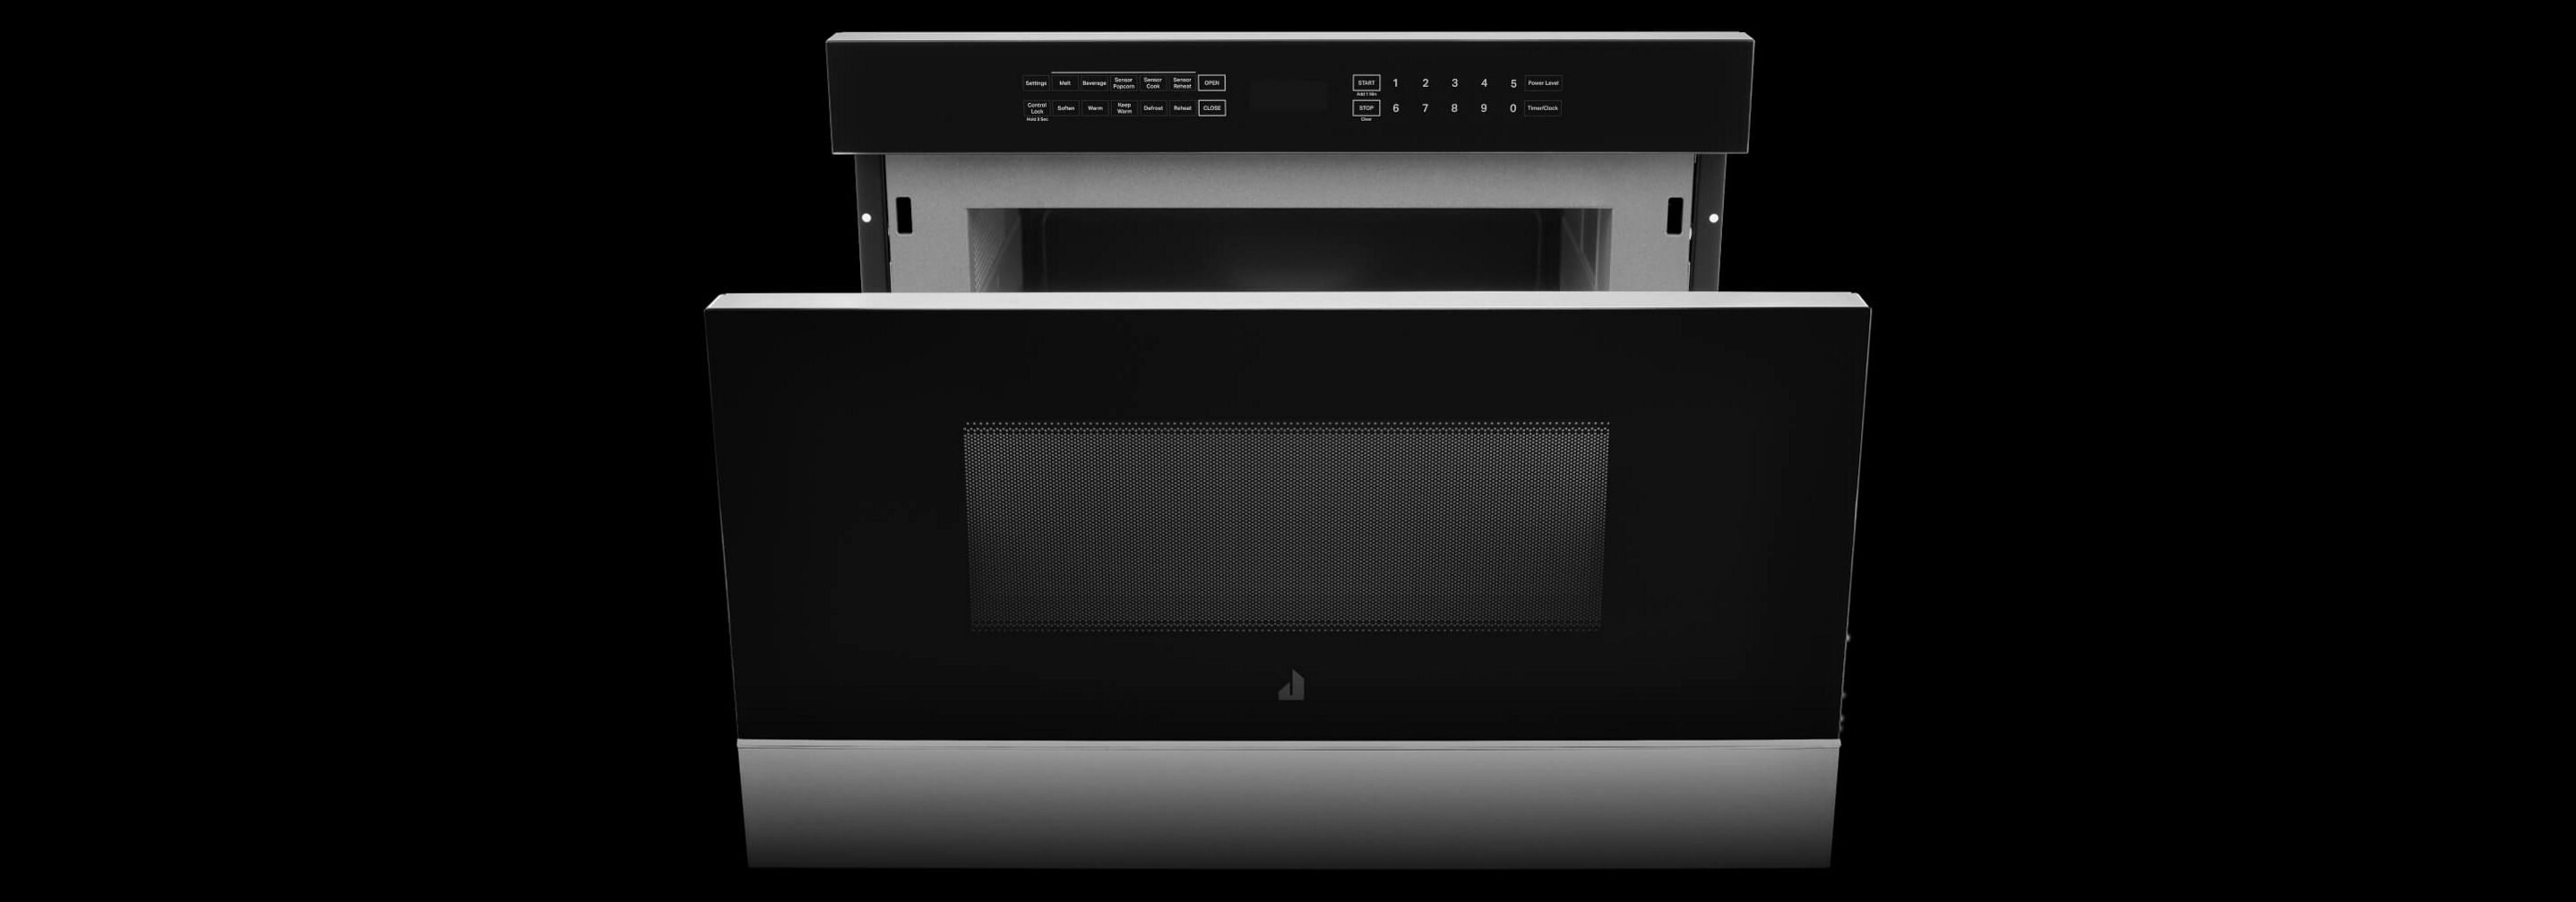 A JennAir® Microwave Drawer opened.